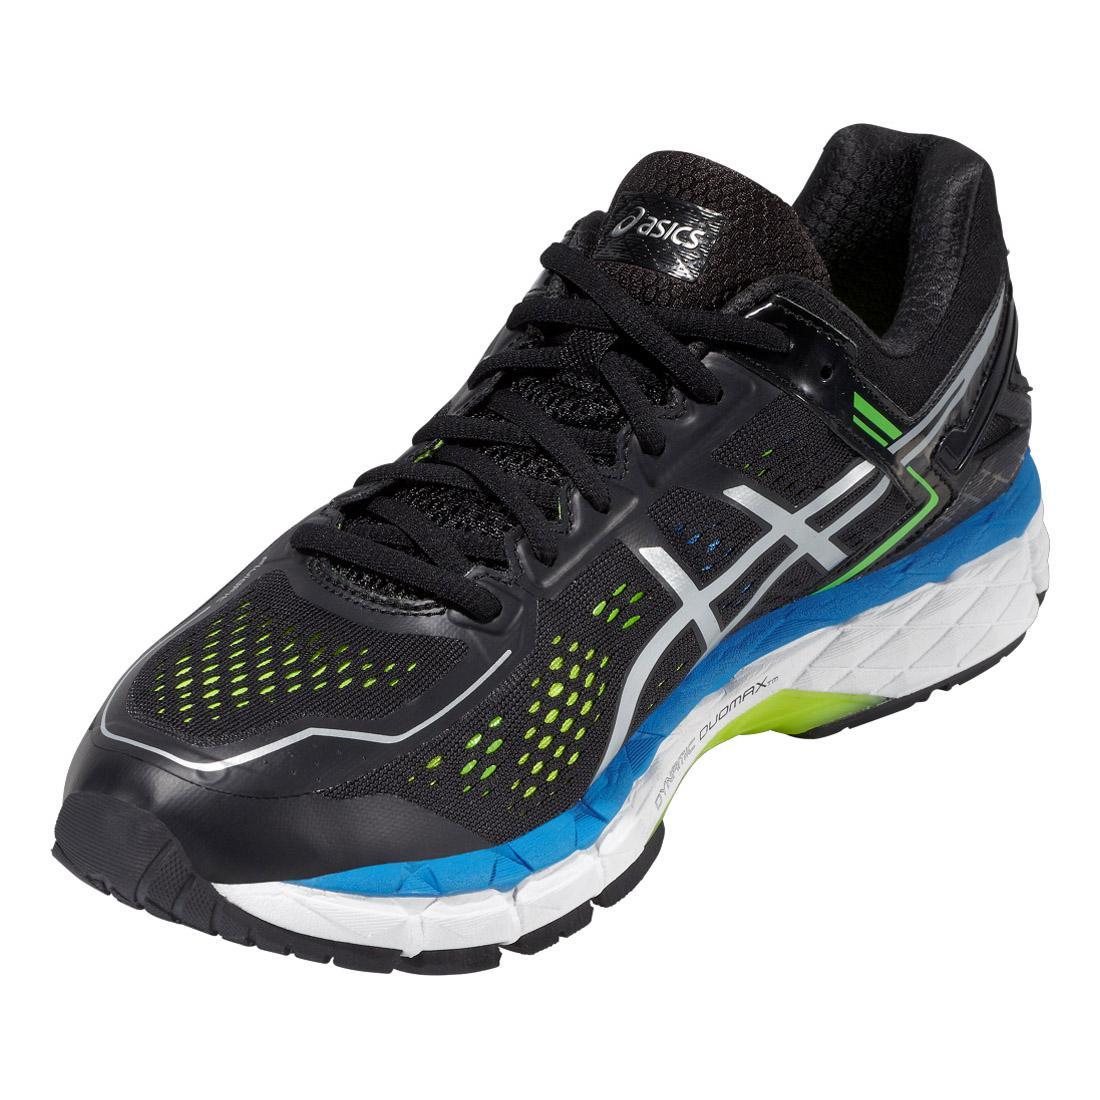 Kayano 20 Running Shoes